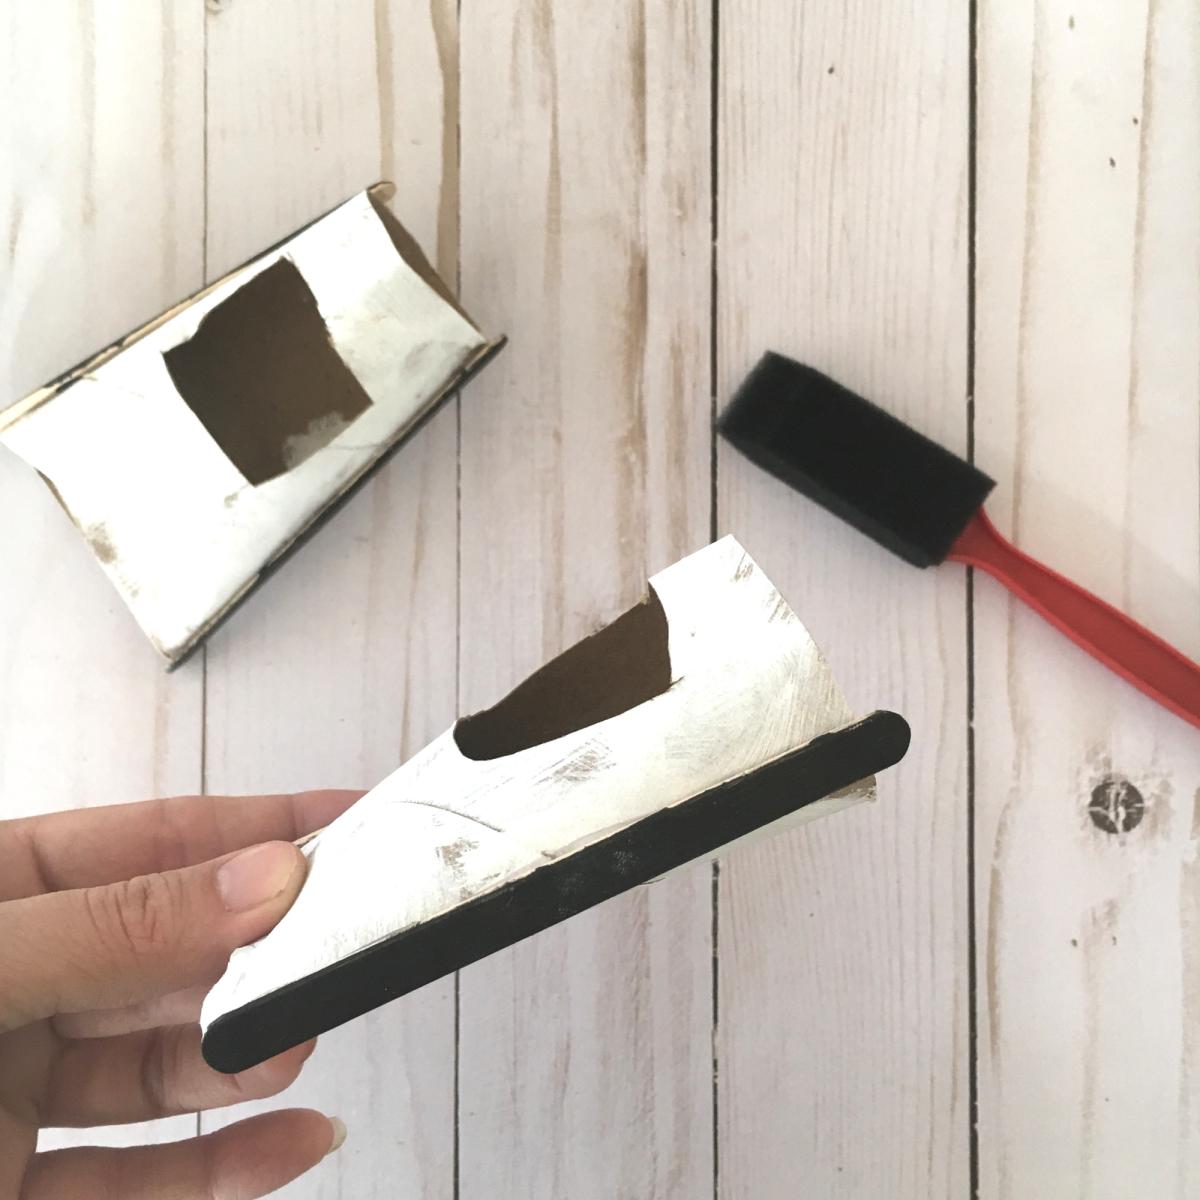 Winter Olympics Craft - Craft Sticks